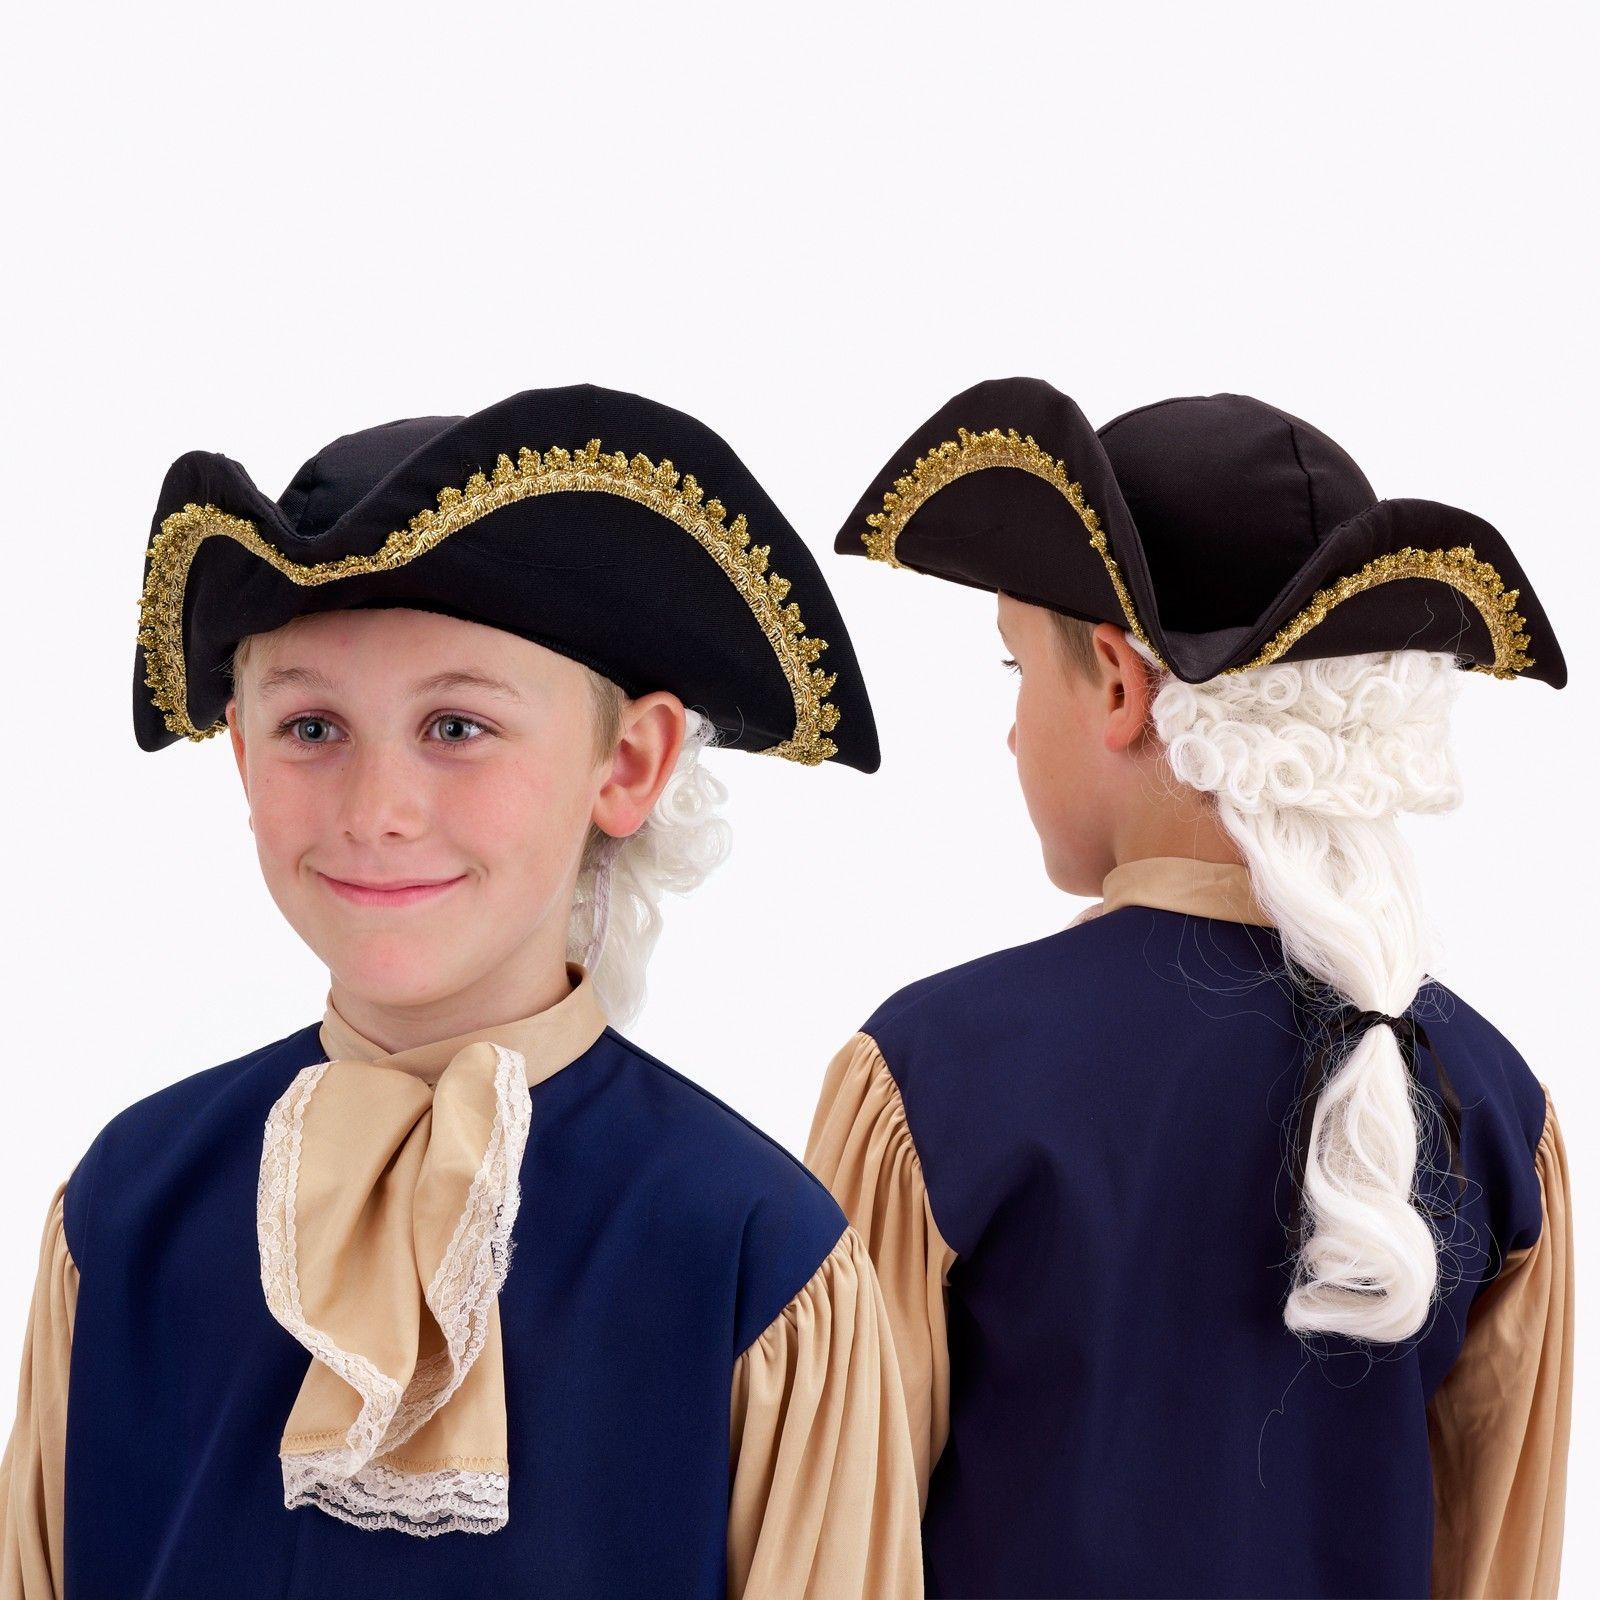 Colonial Man Wig Powder White George Washington Halloween Costume Accessory